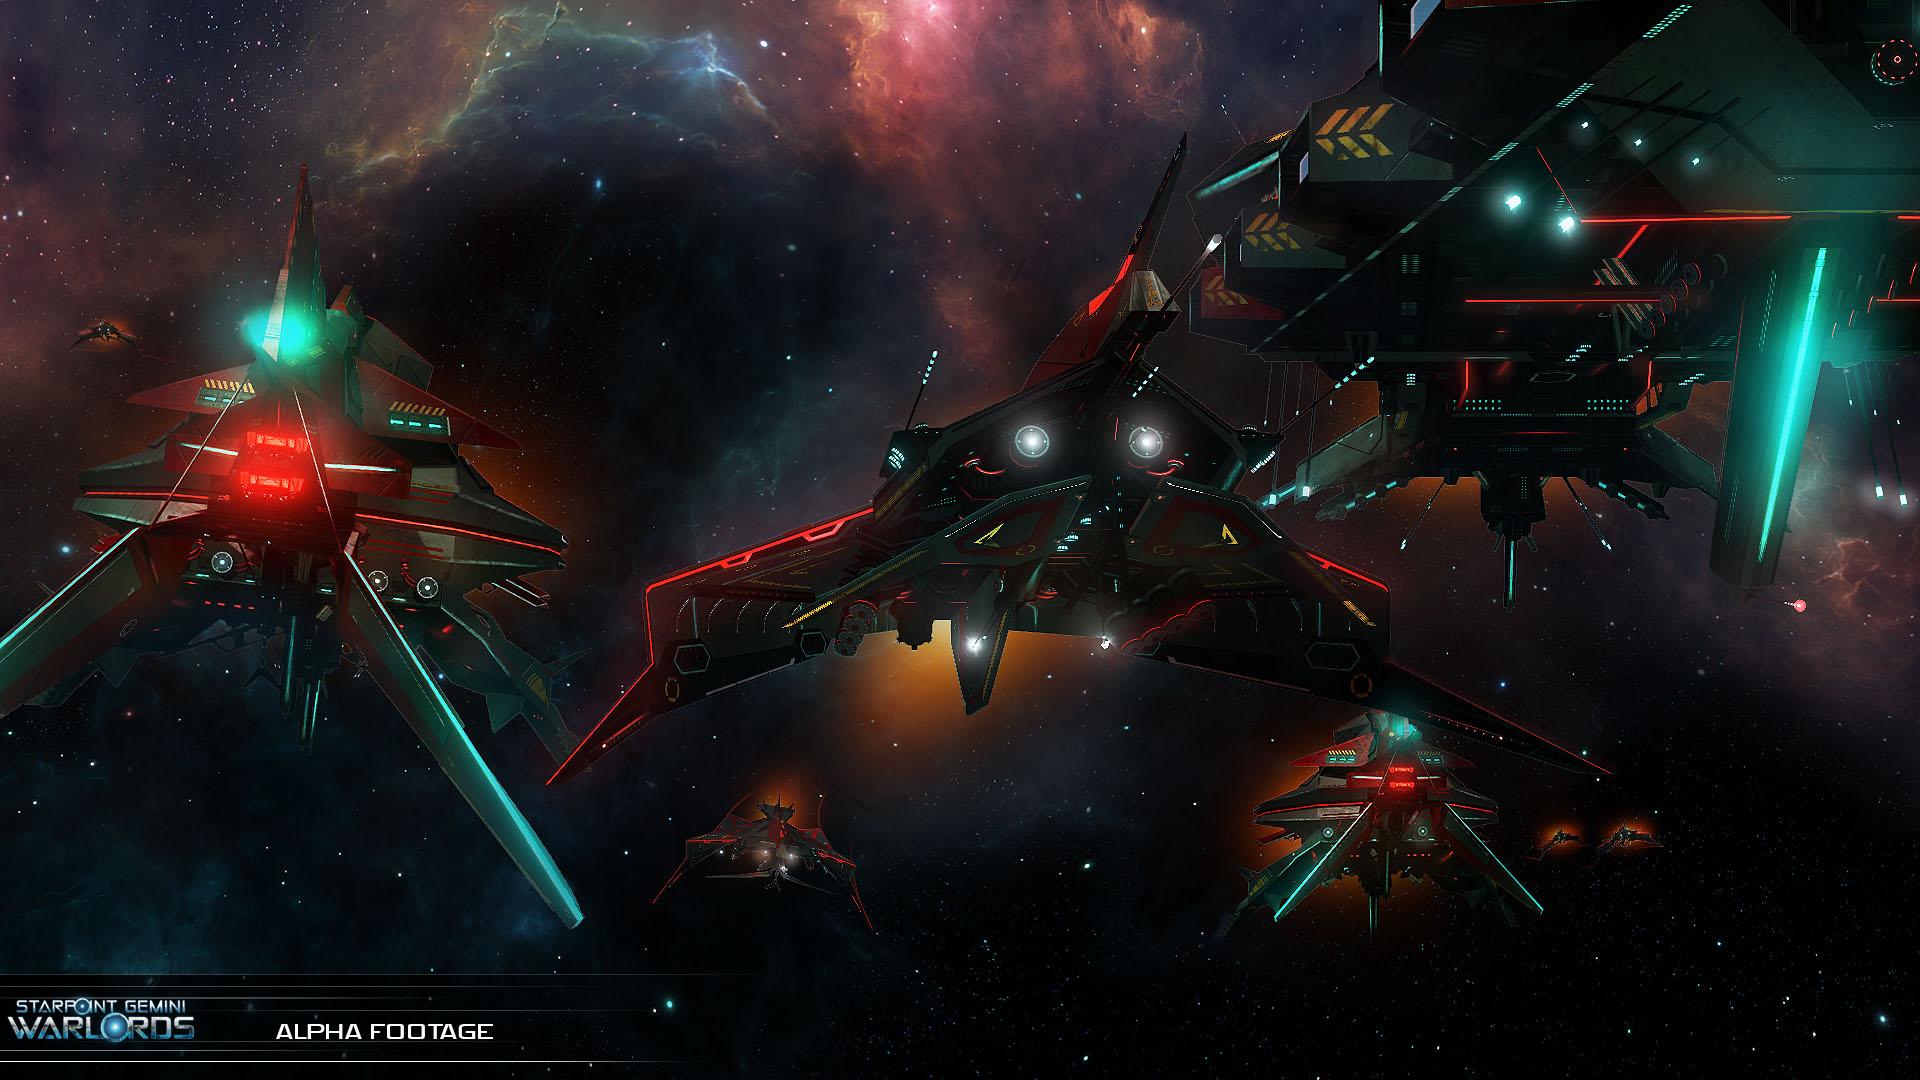 StarpointGemini Warlords 04